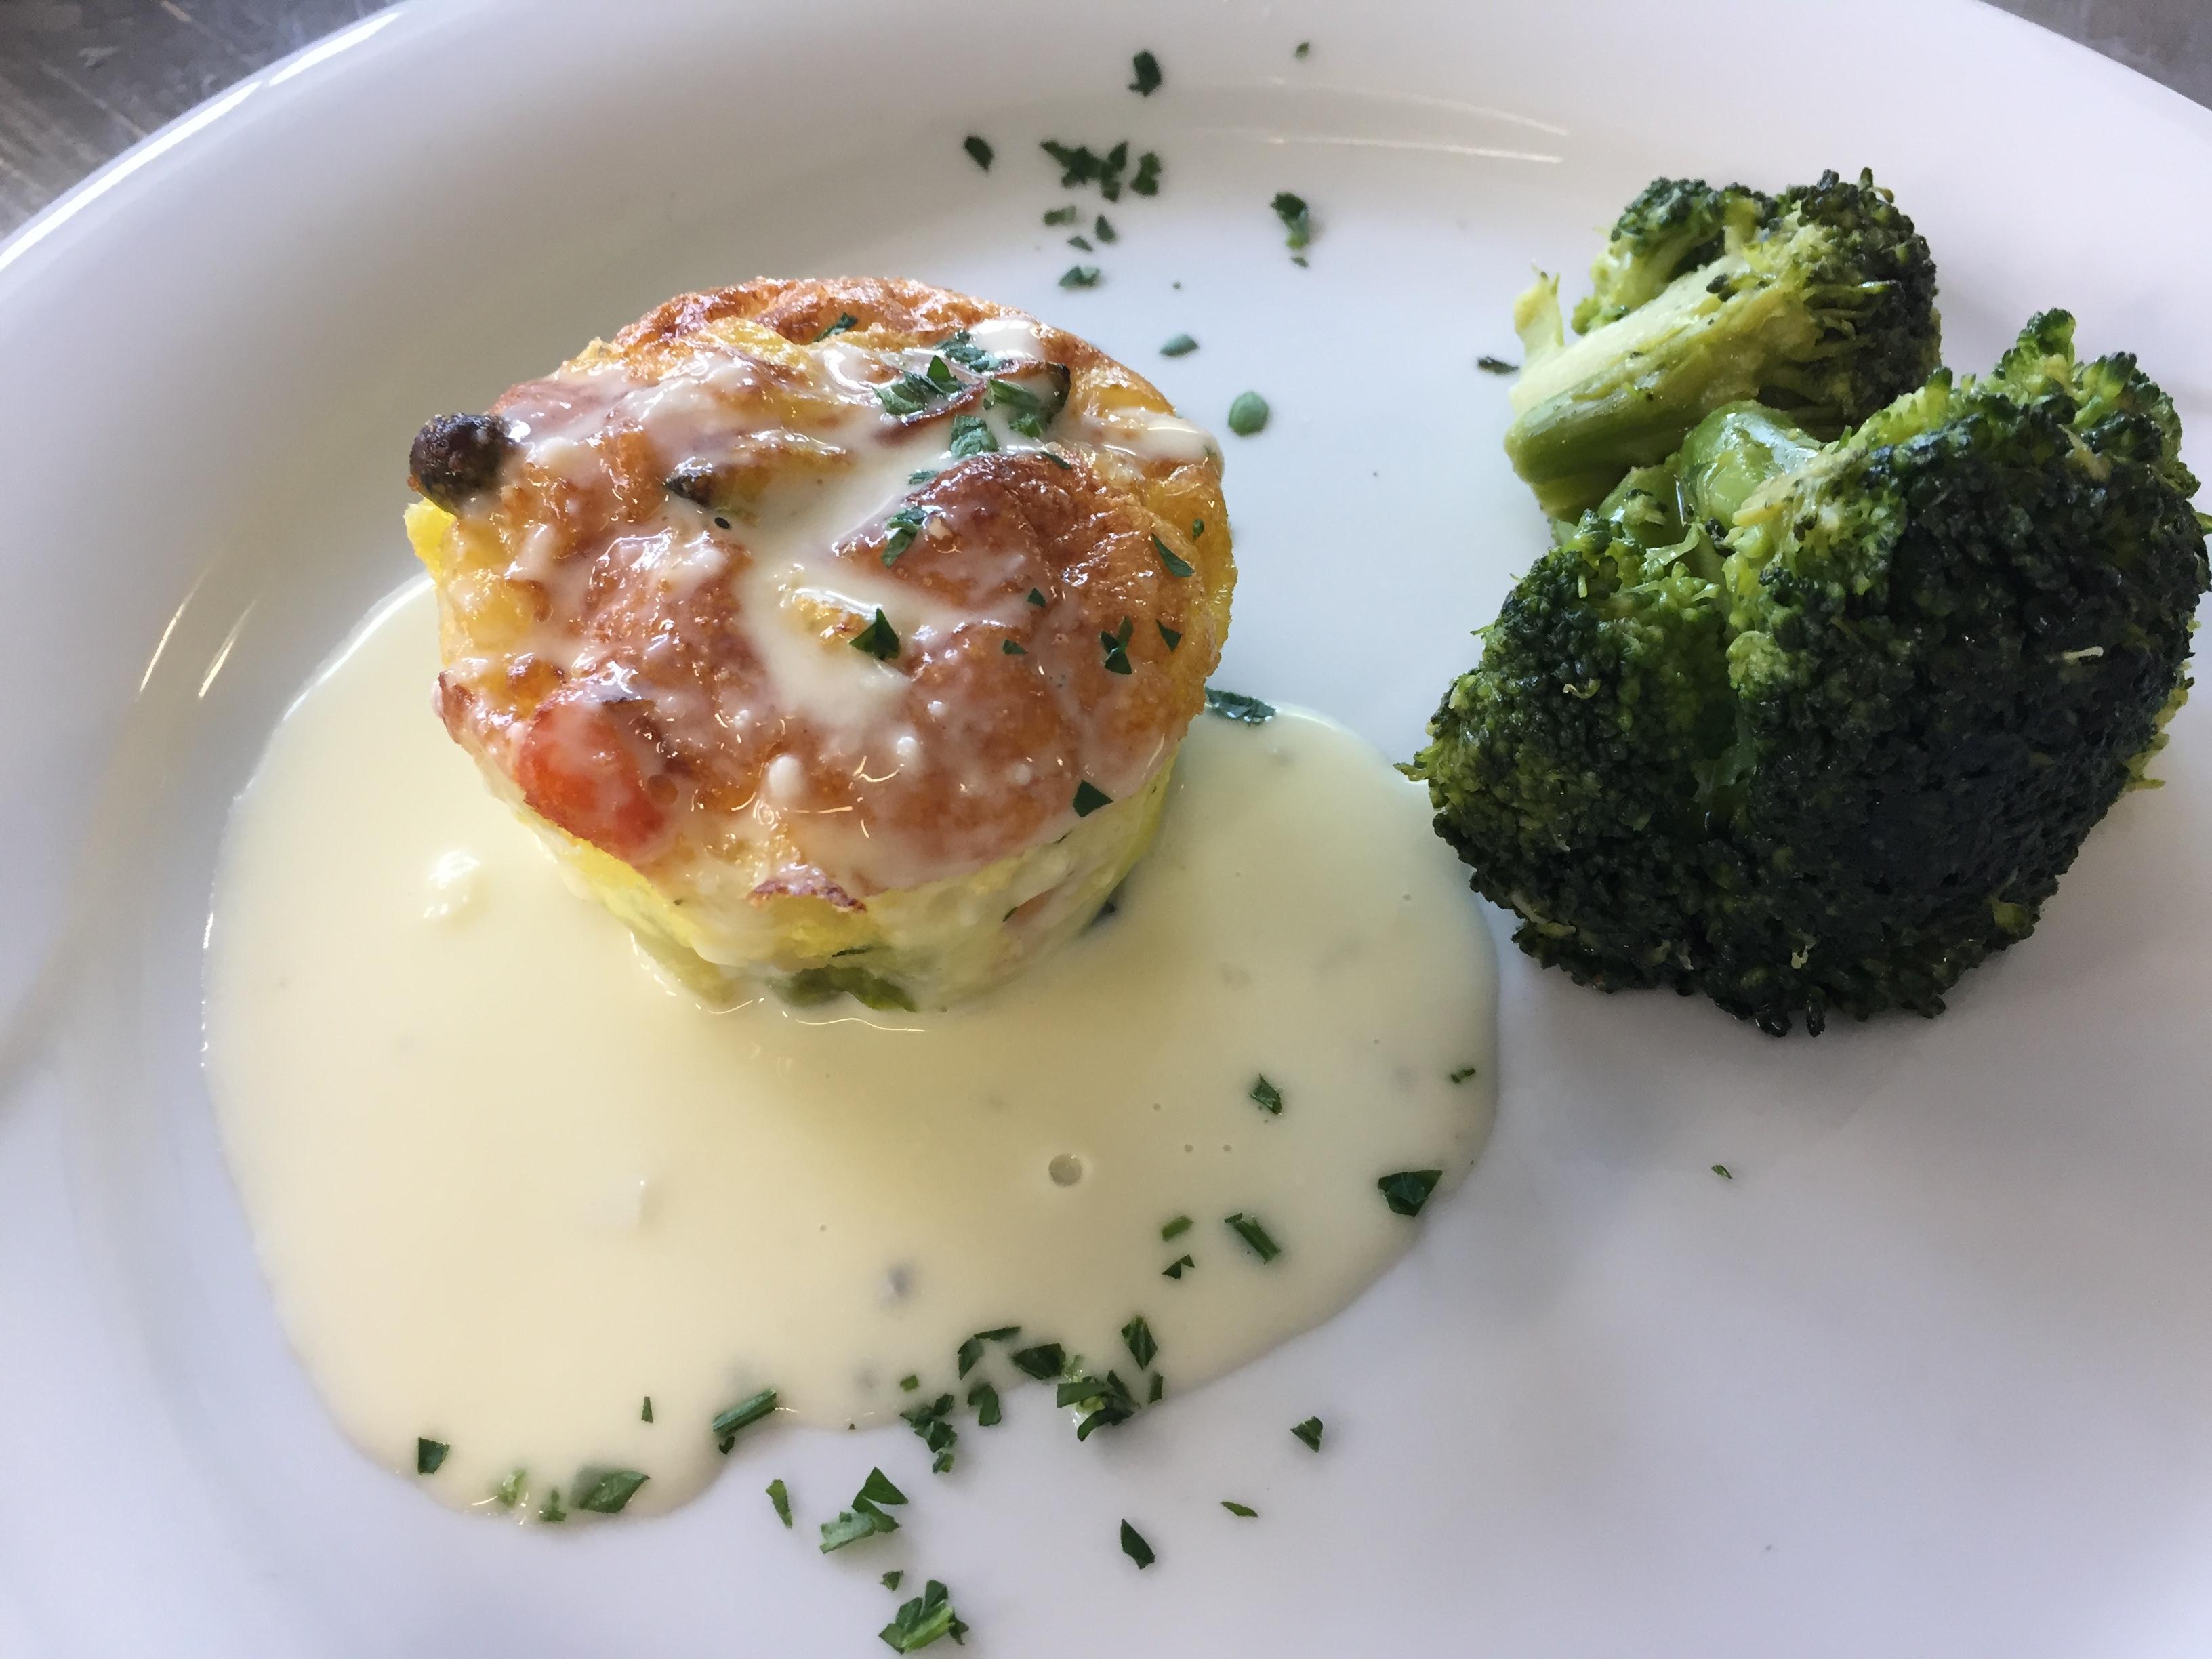 Flan di verdure con salsa di parmigiano reggiano